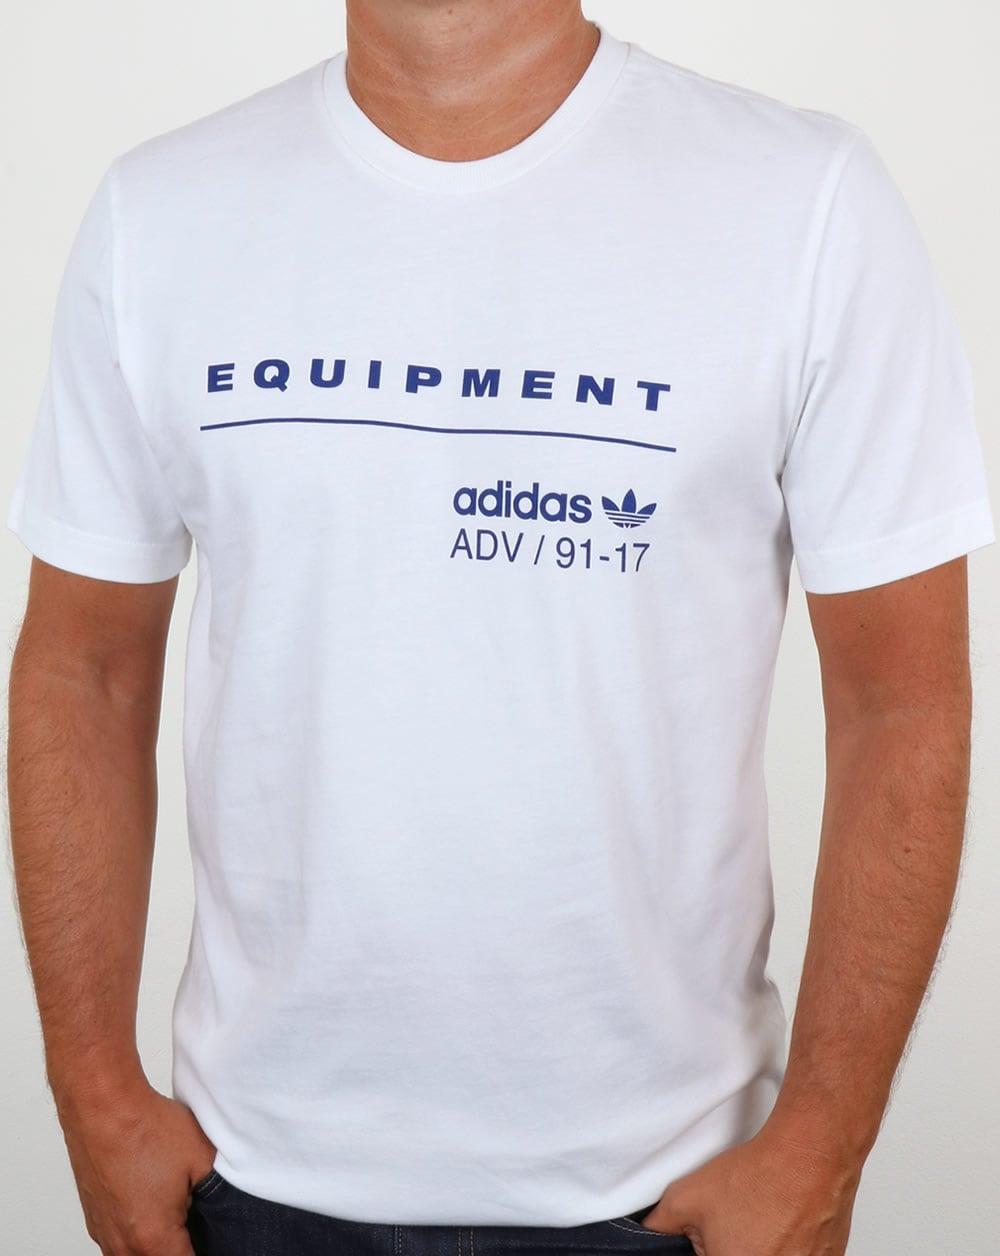 adidas t shirt 98